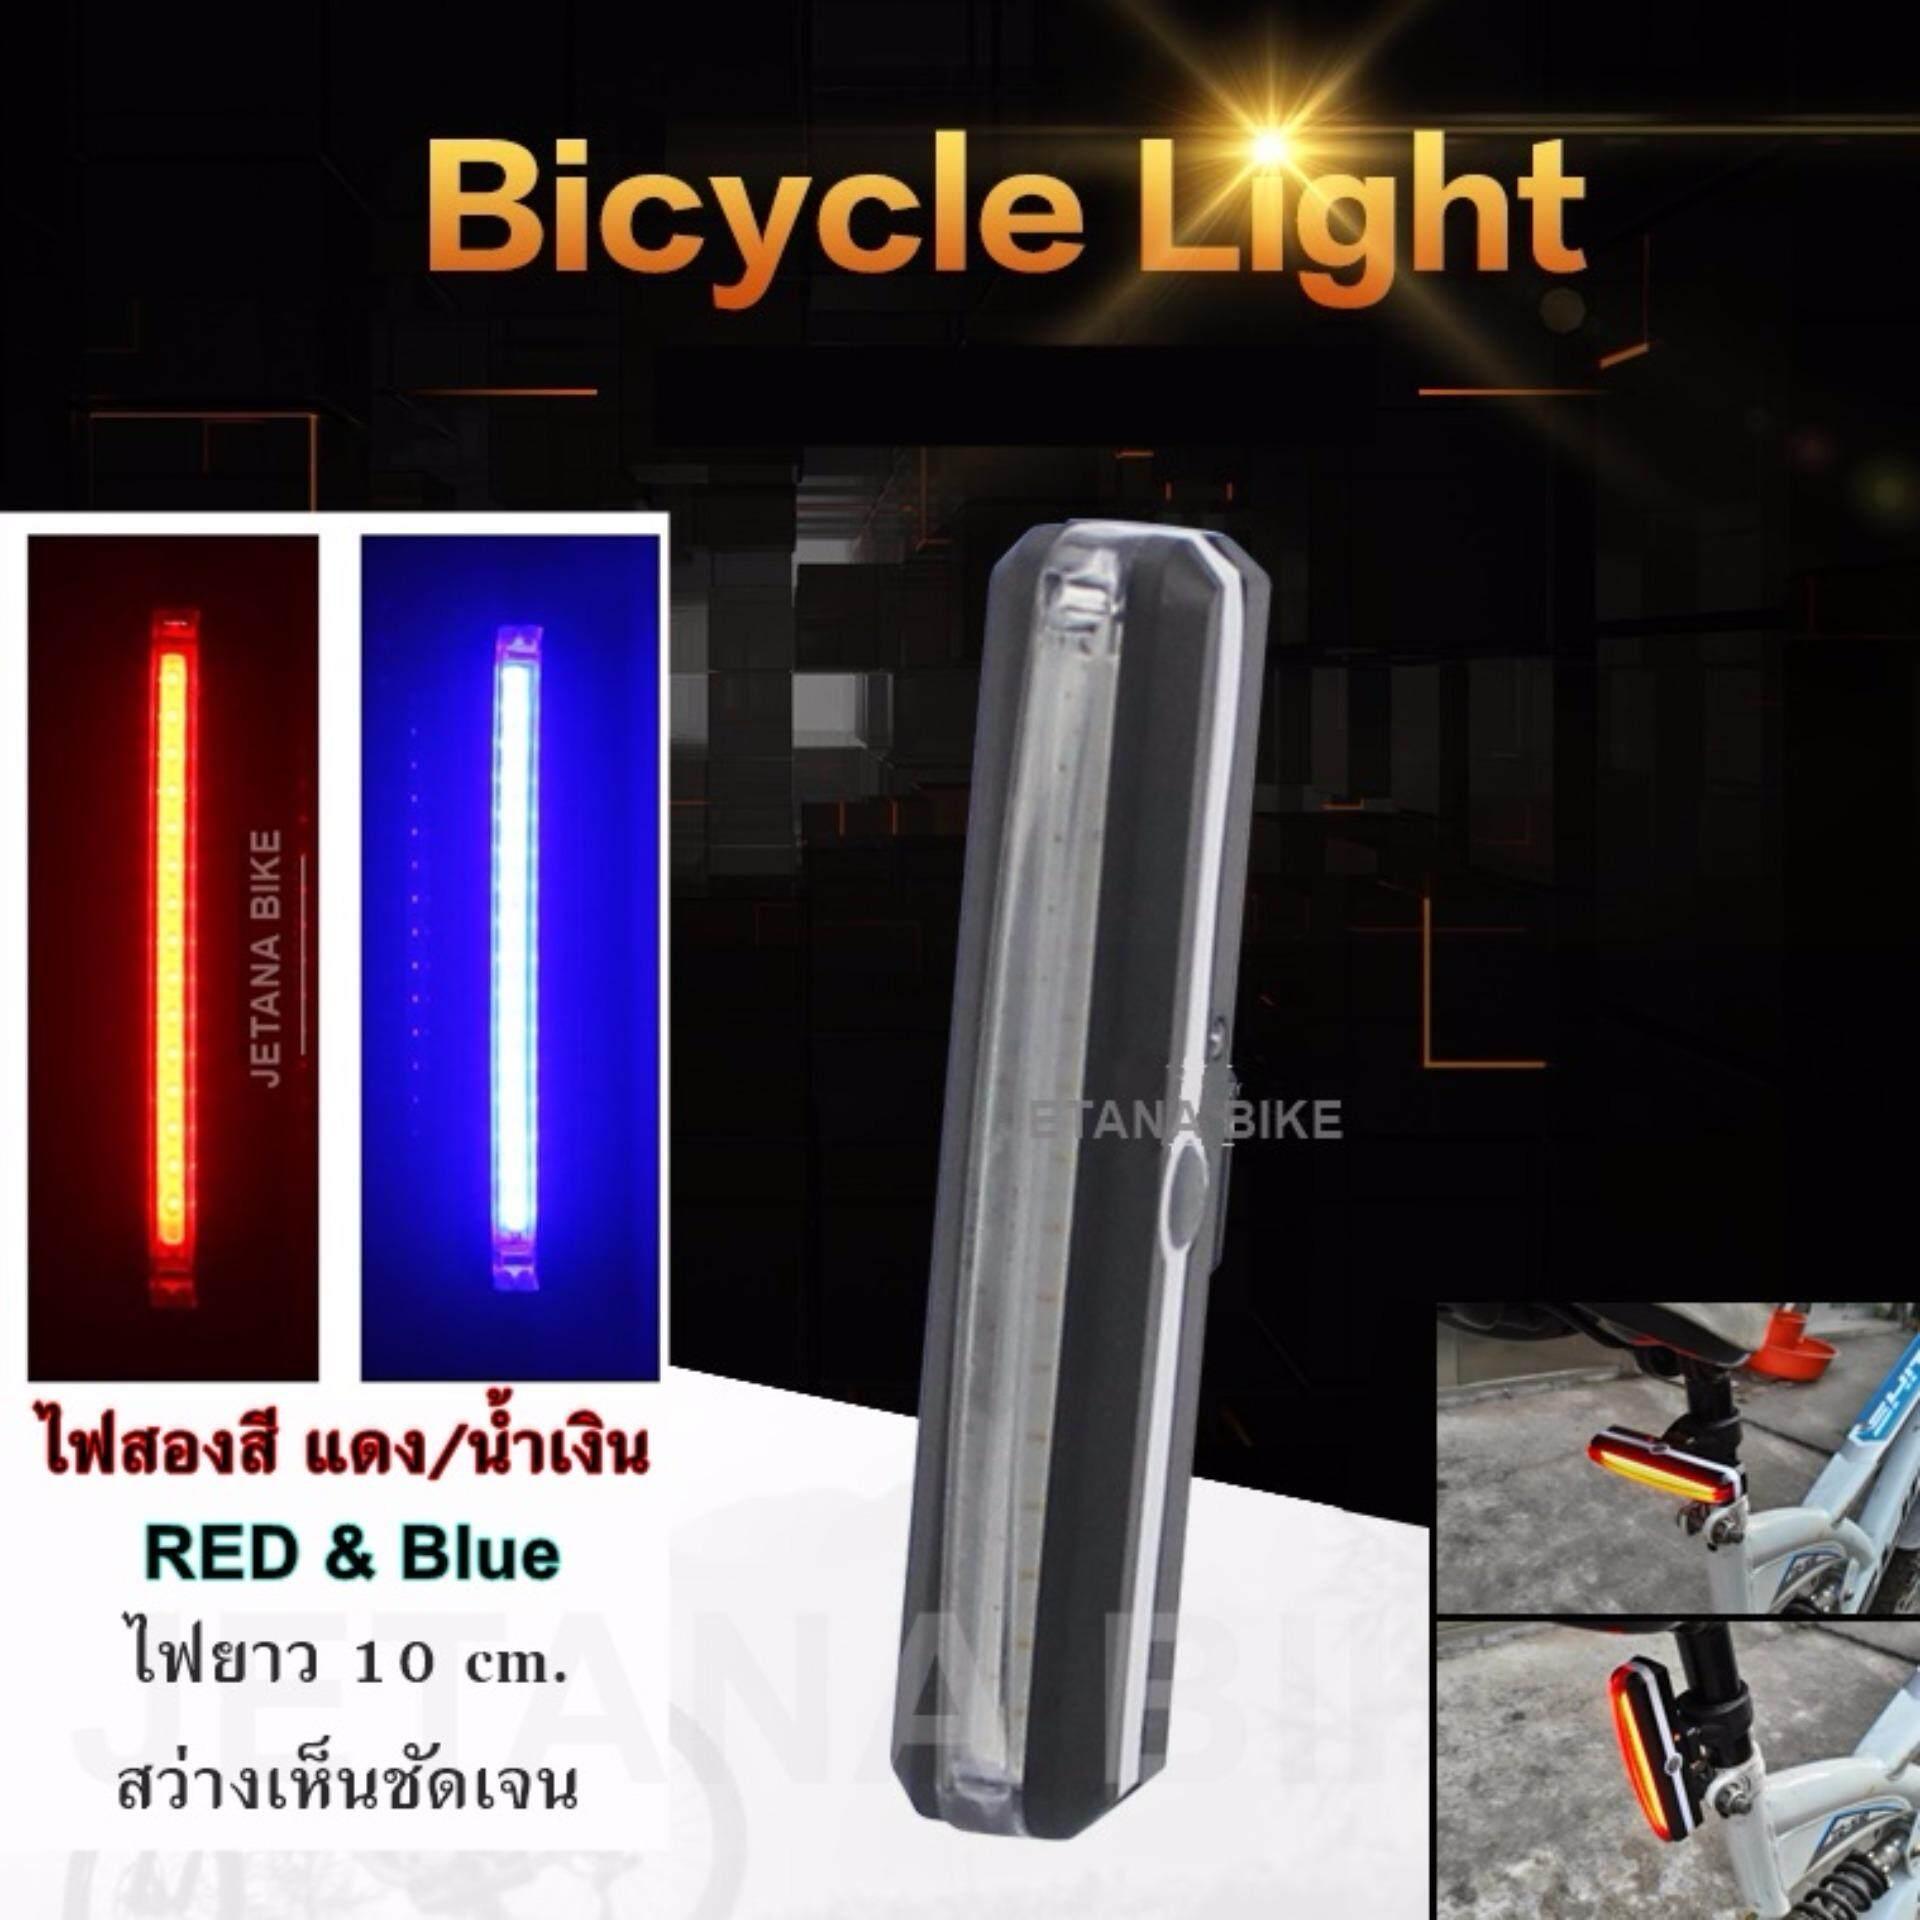 Jetana Raypal ไฟจักรยาน LED ไฟสองสี แดง น้ำเงิน สว่างมาก ไฟยาว ไฟท้ายจักรยาน ชาร์จ USB กันน้ำ